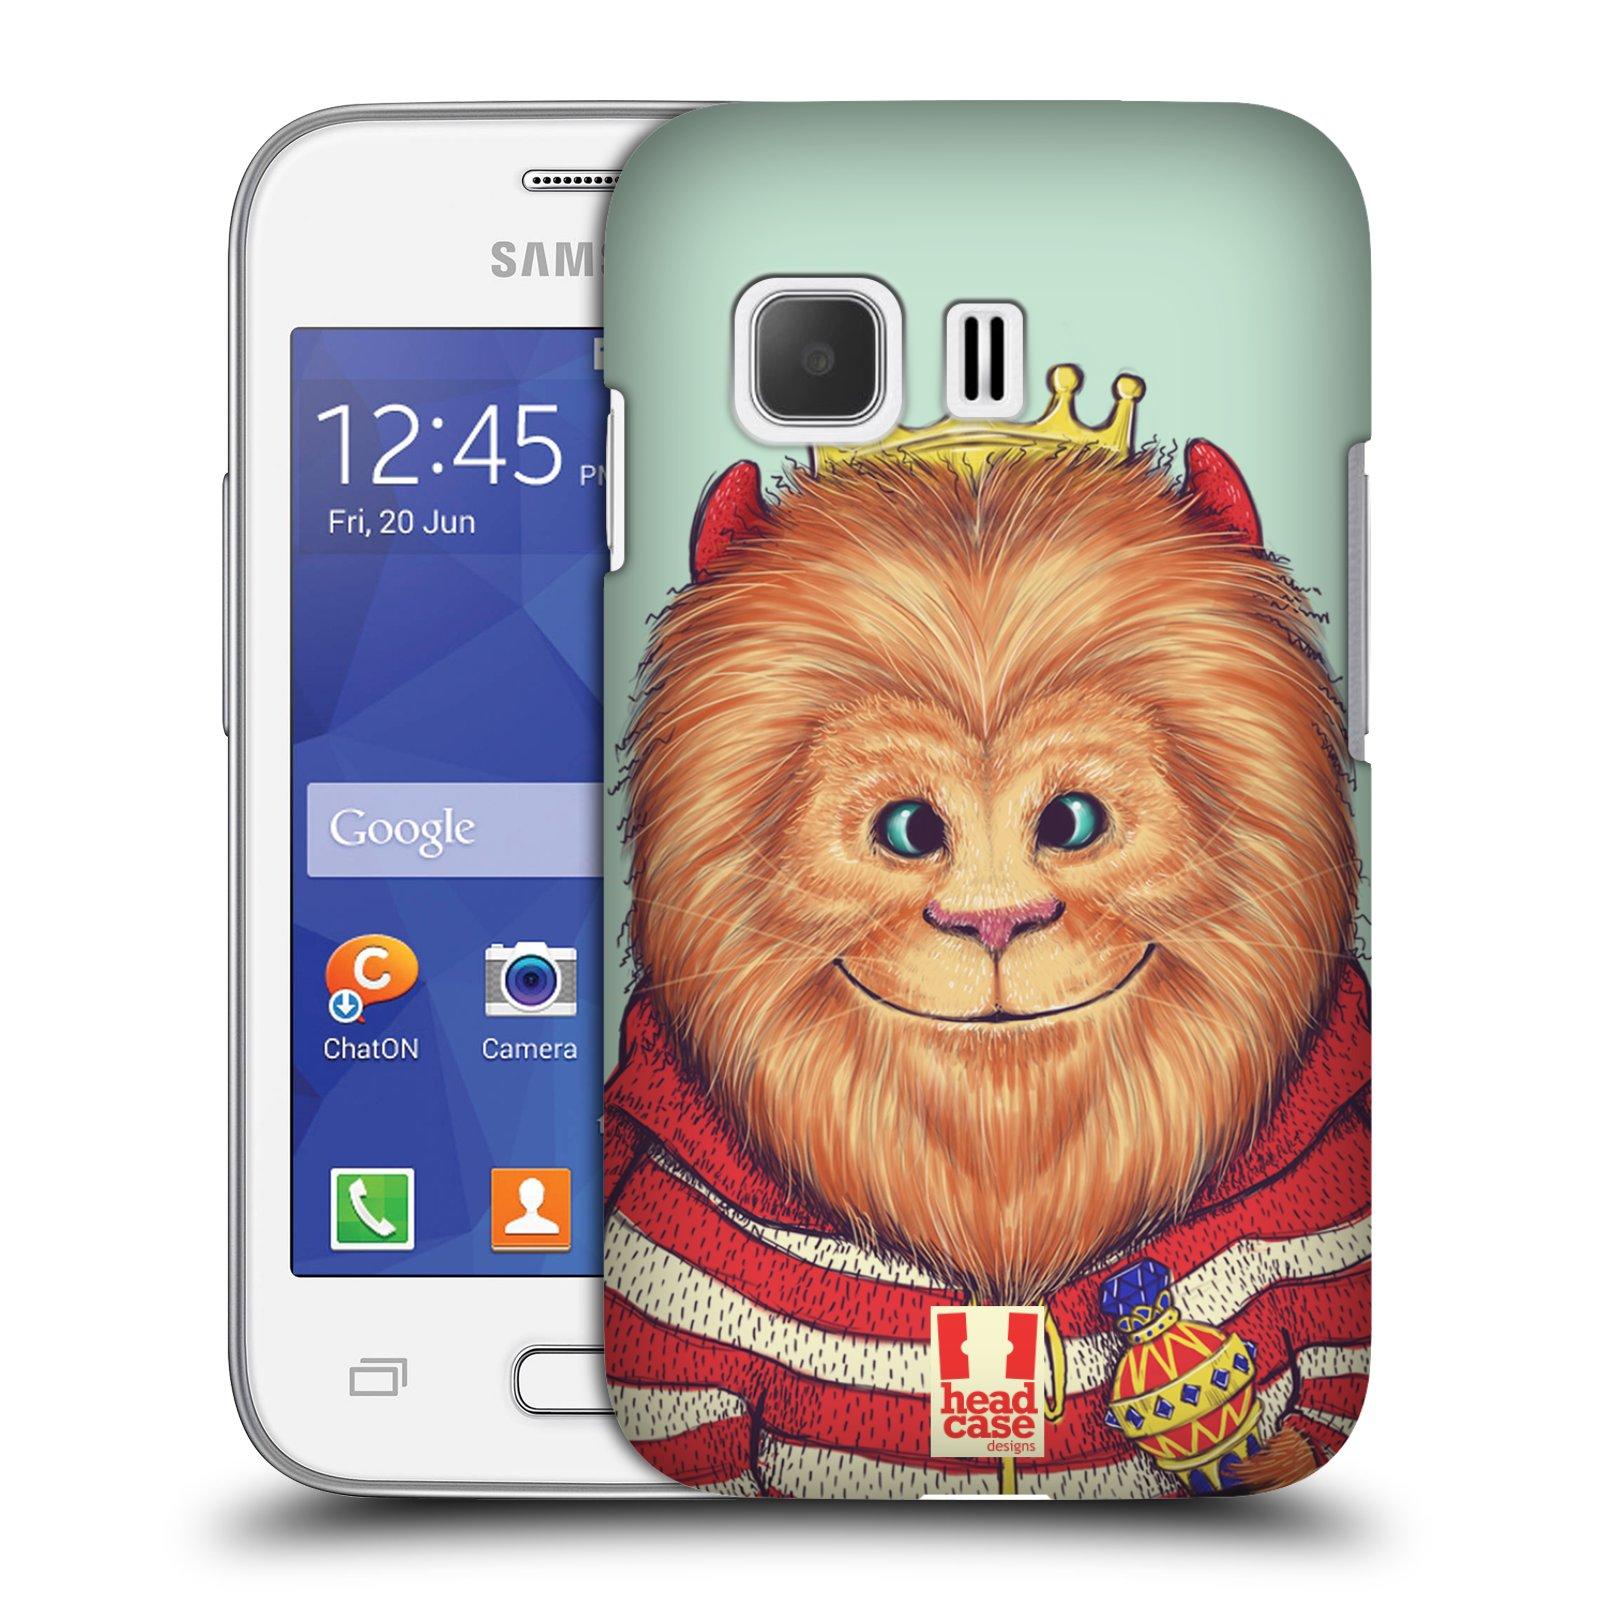 HEAD CASE plastový obal na mobil SAMSUNG Galaxy Young 2 (G130) vzor Kreslená zvířátka lev